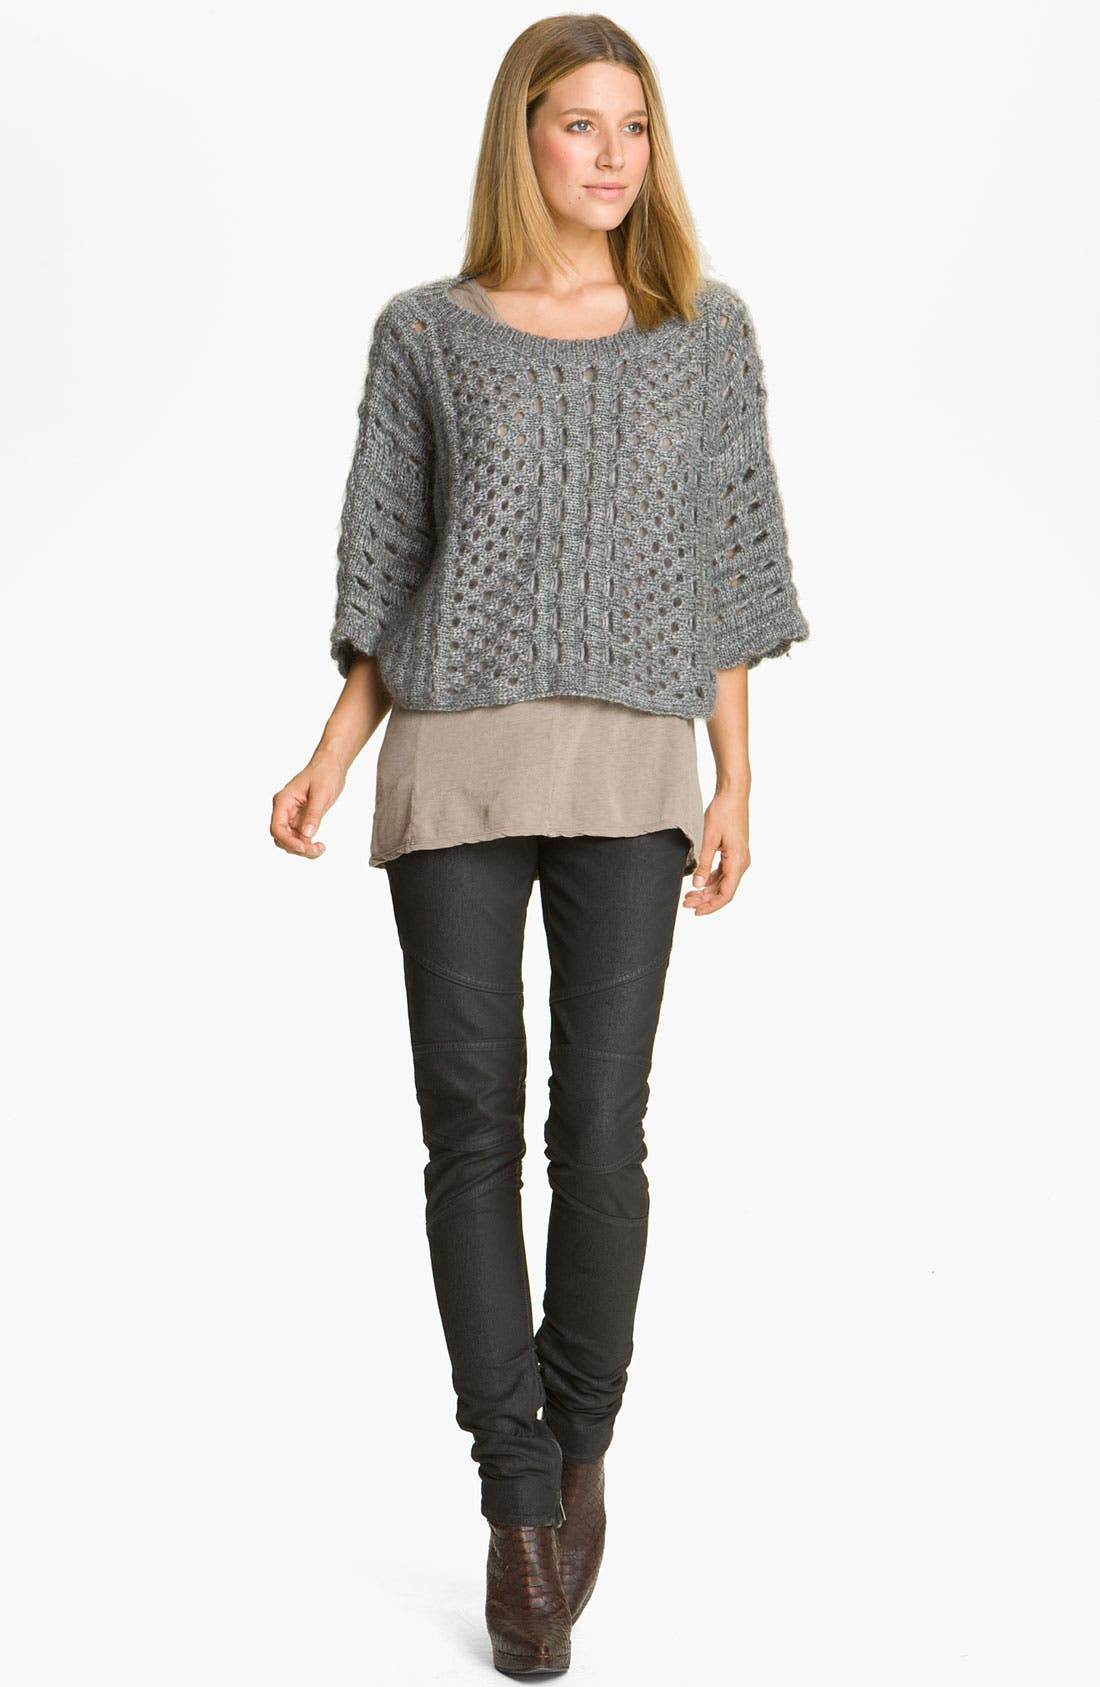 Alternate Image 1 Selected - Skaist-Taylor Open Crochet Pullover